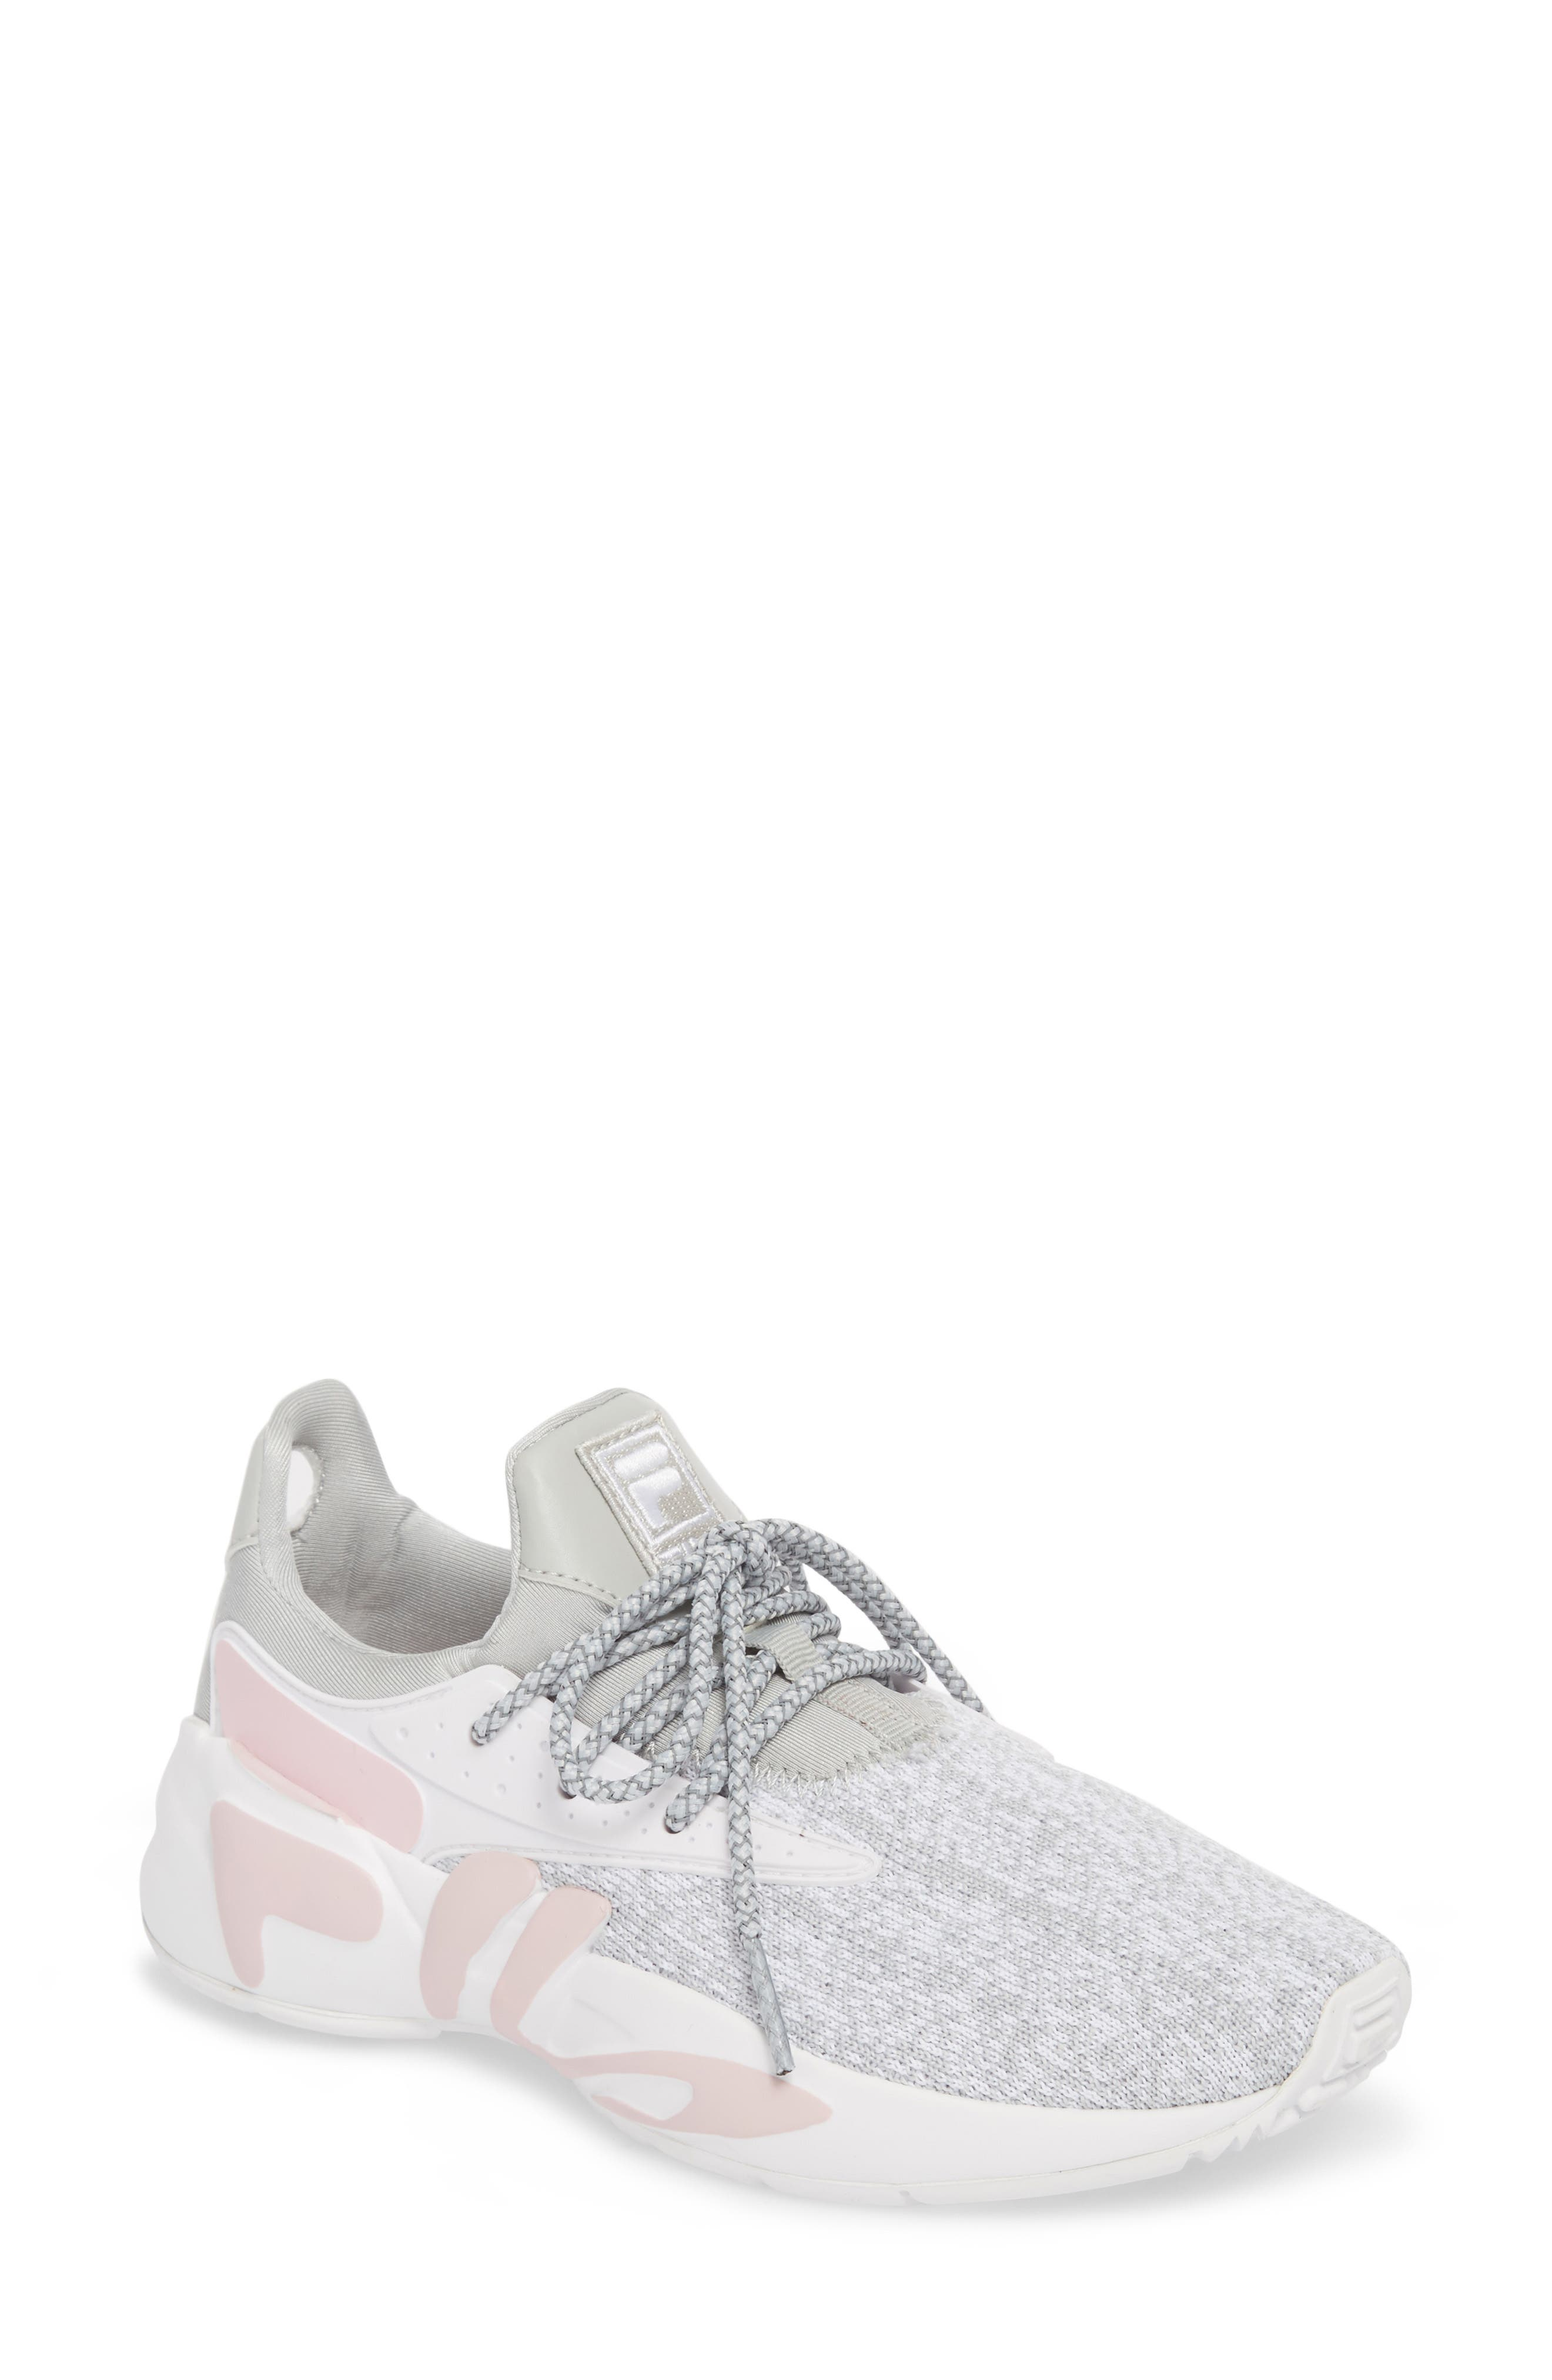 Mindbreaker 2.0 Sneaker,                         Main,                         color, HIGHRISE/ WHITE/ CHALK PINK